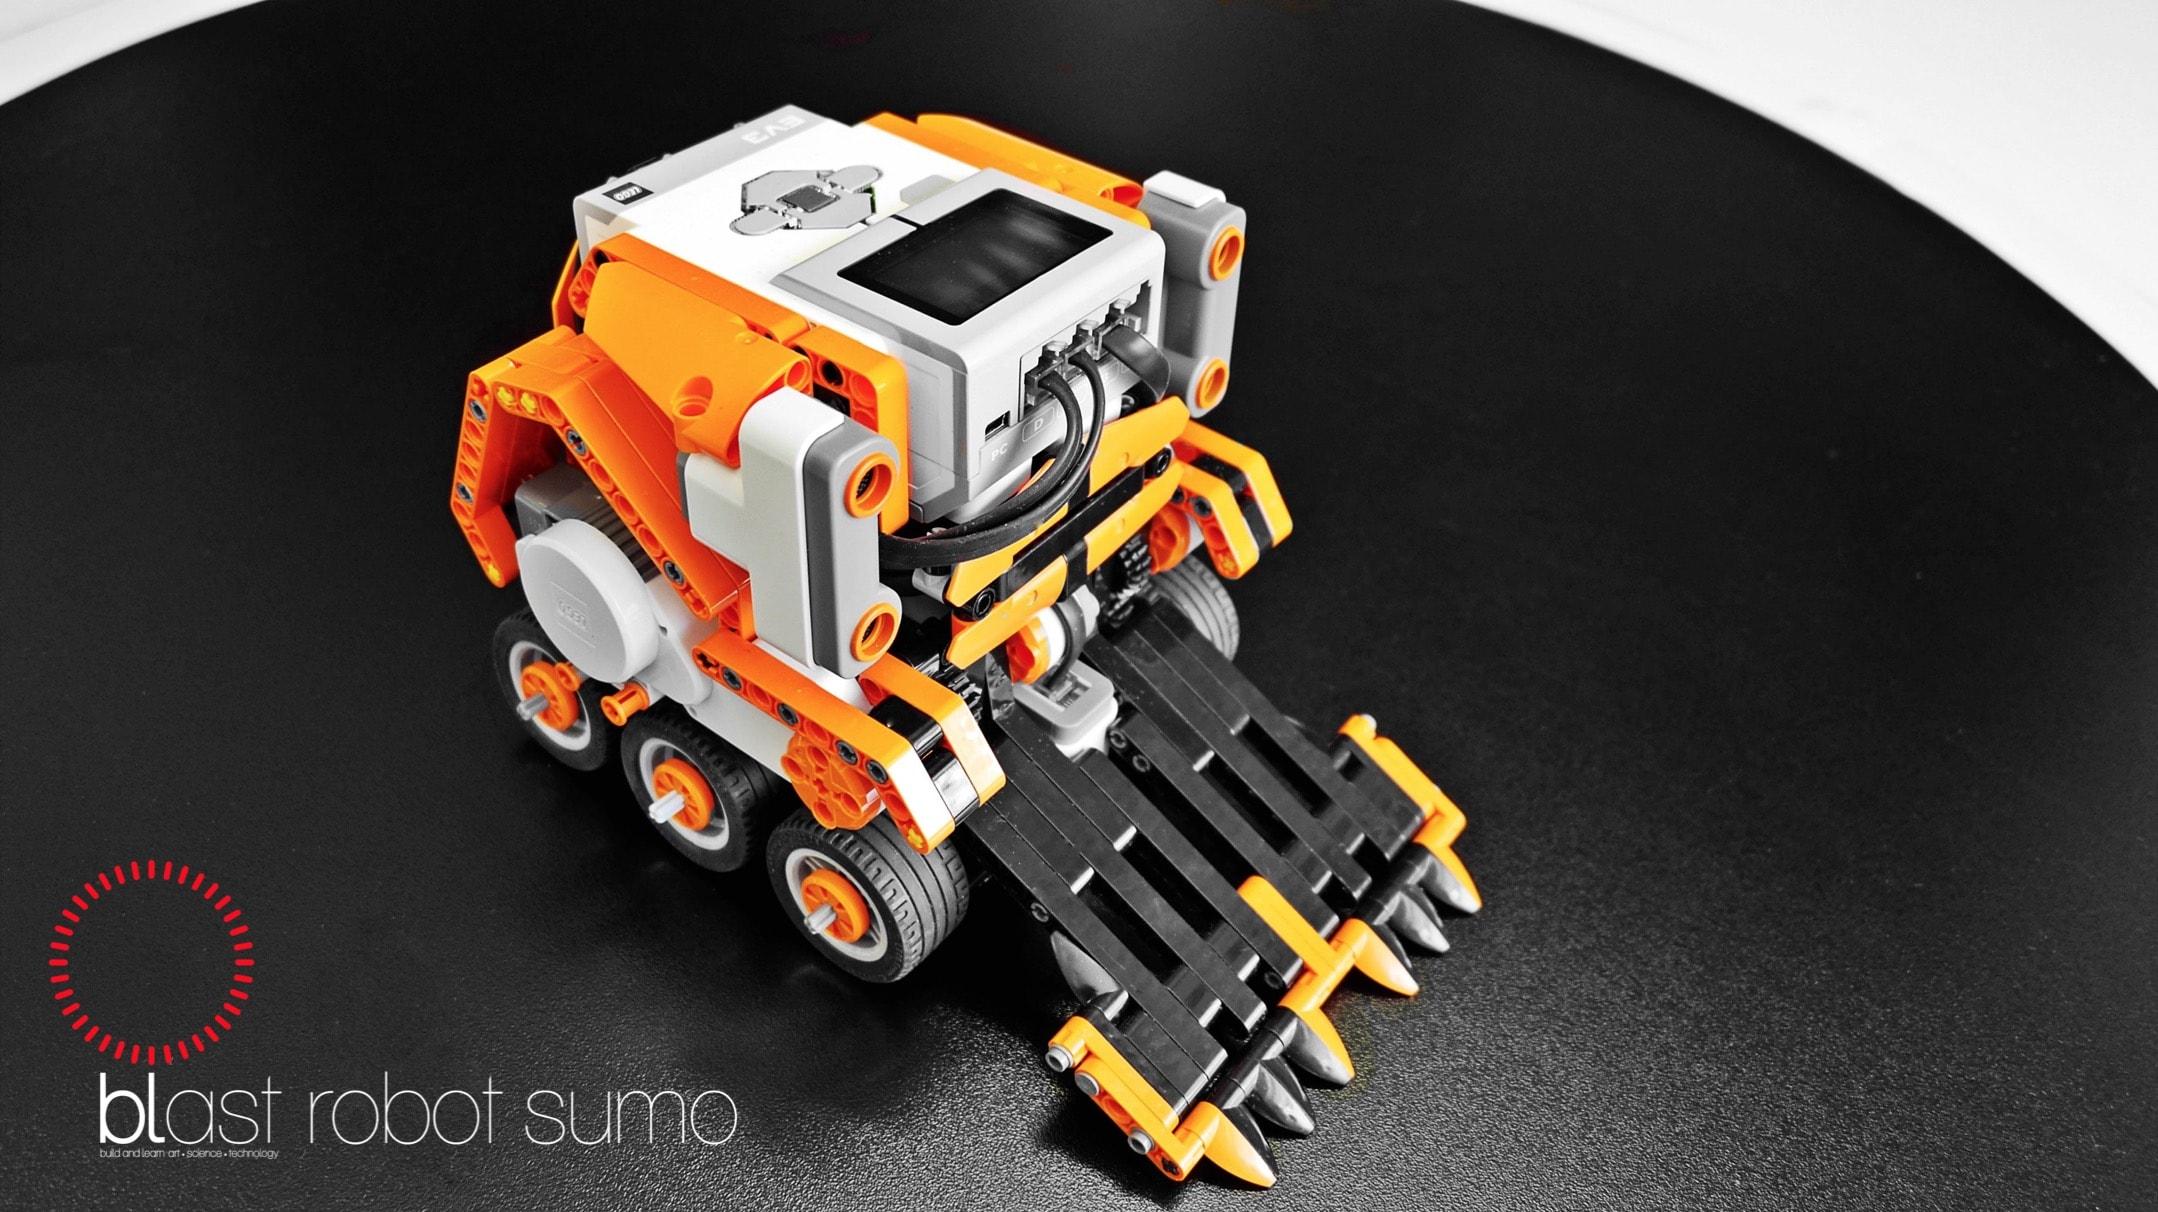 blast robot sumo II